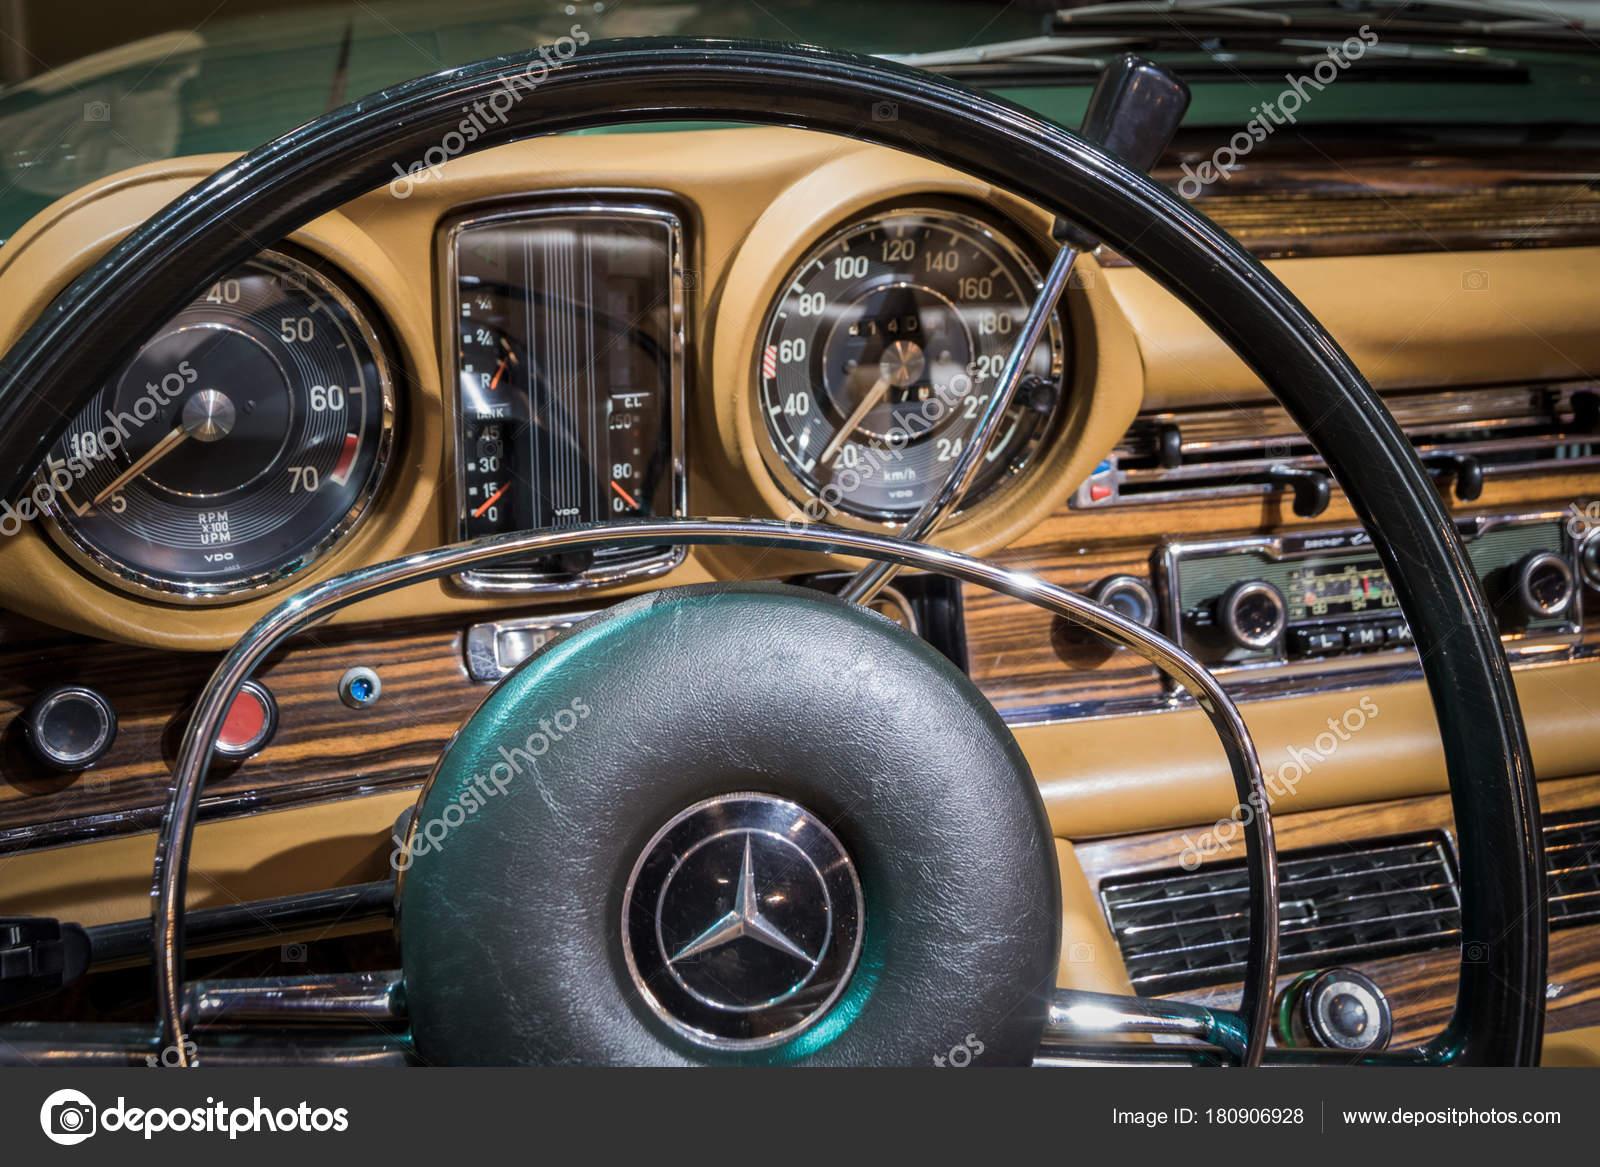 Essen Germany Apr 2017 Vintage Mercedes Benz 280 Coupe Interior Stock Photo